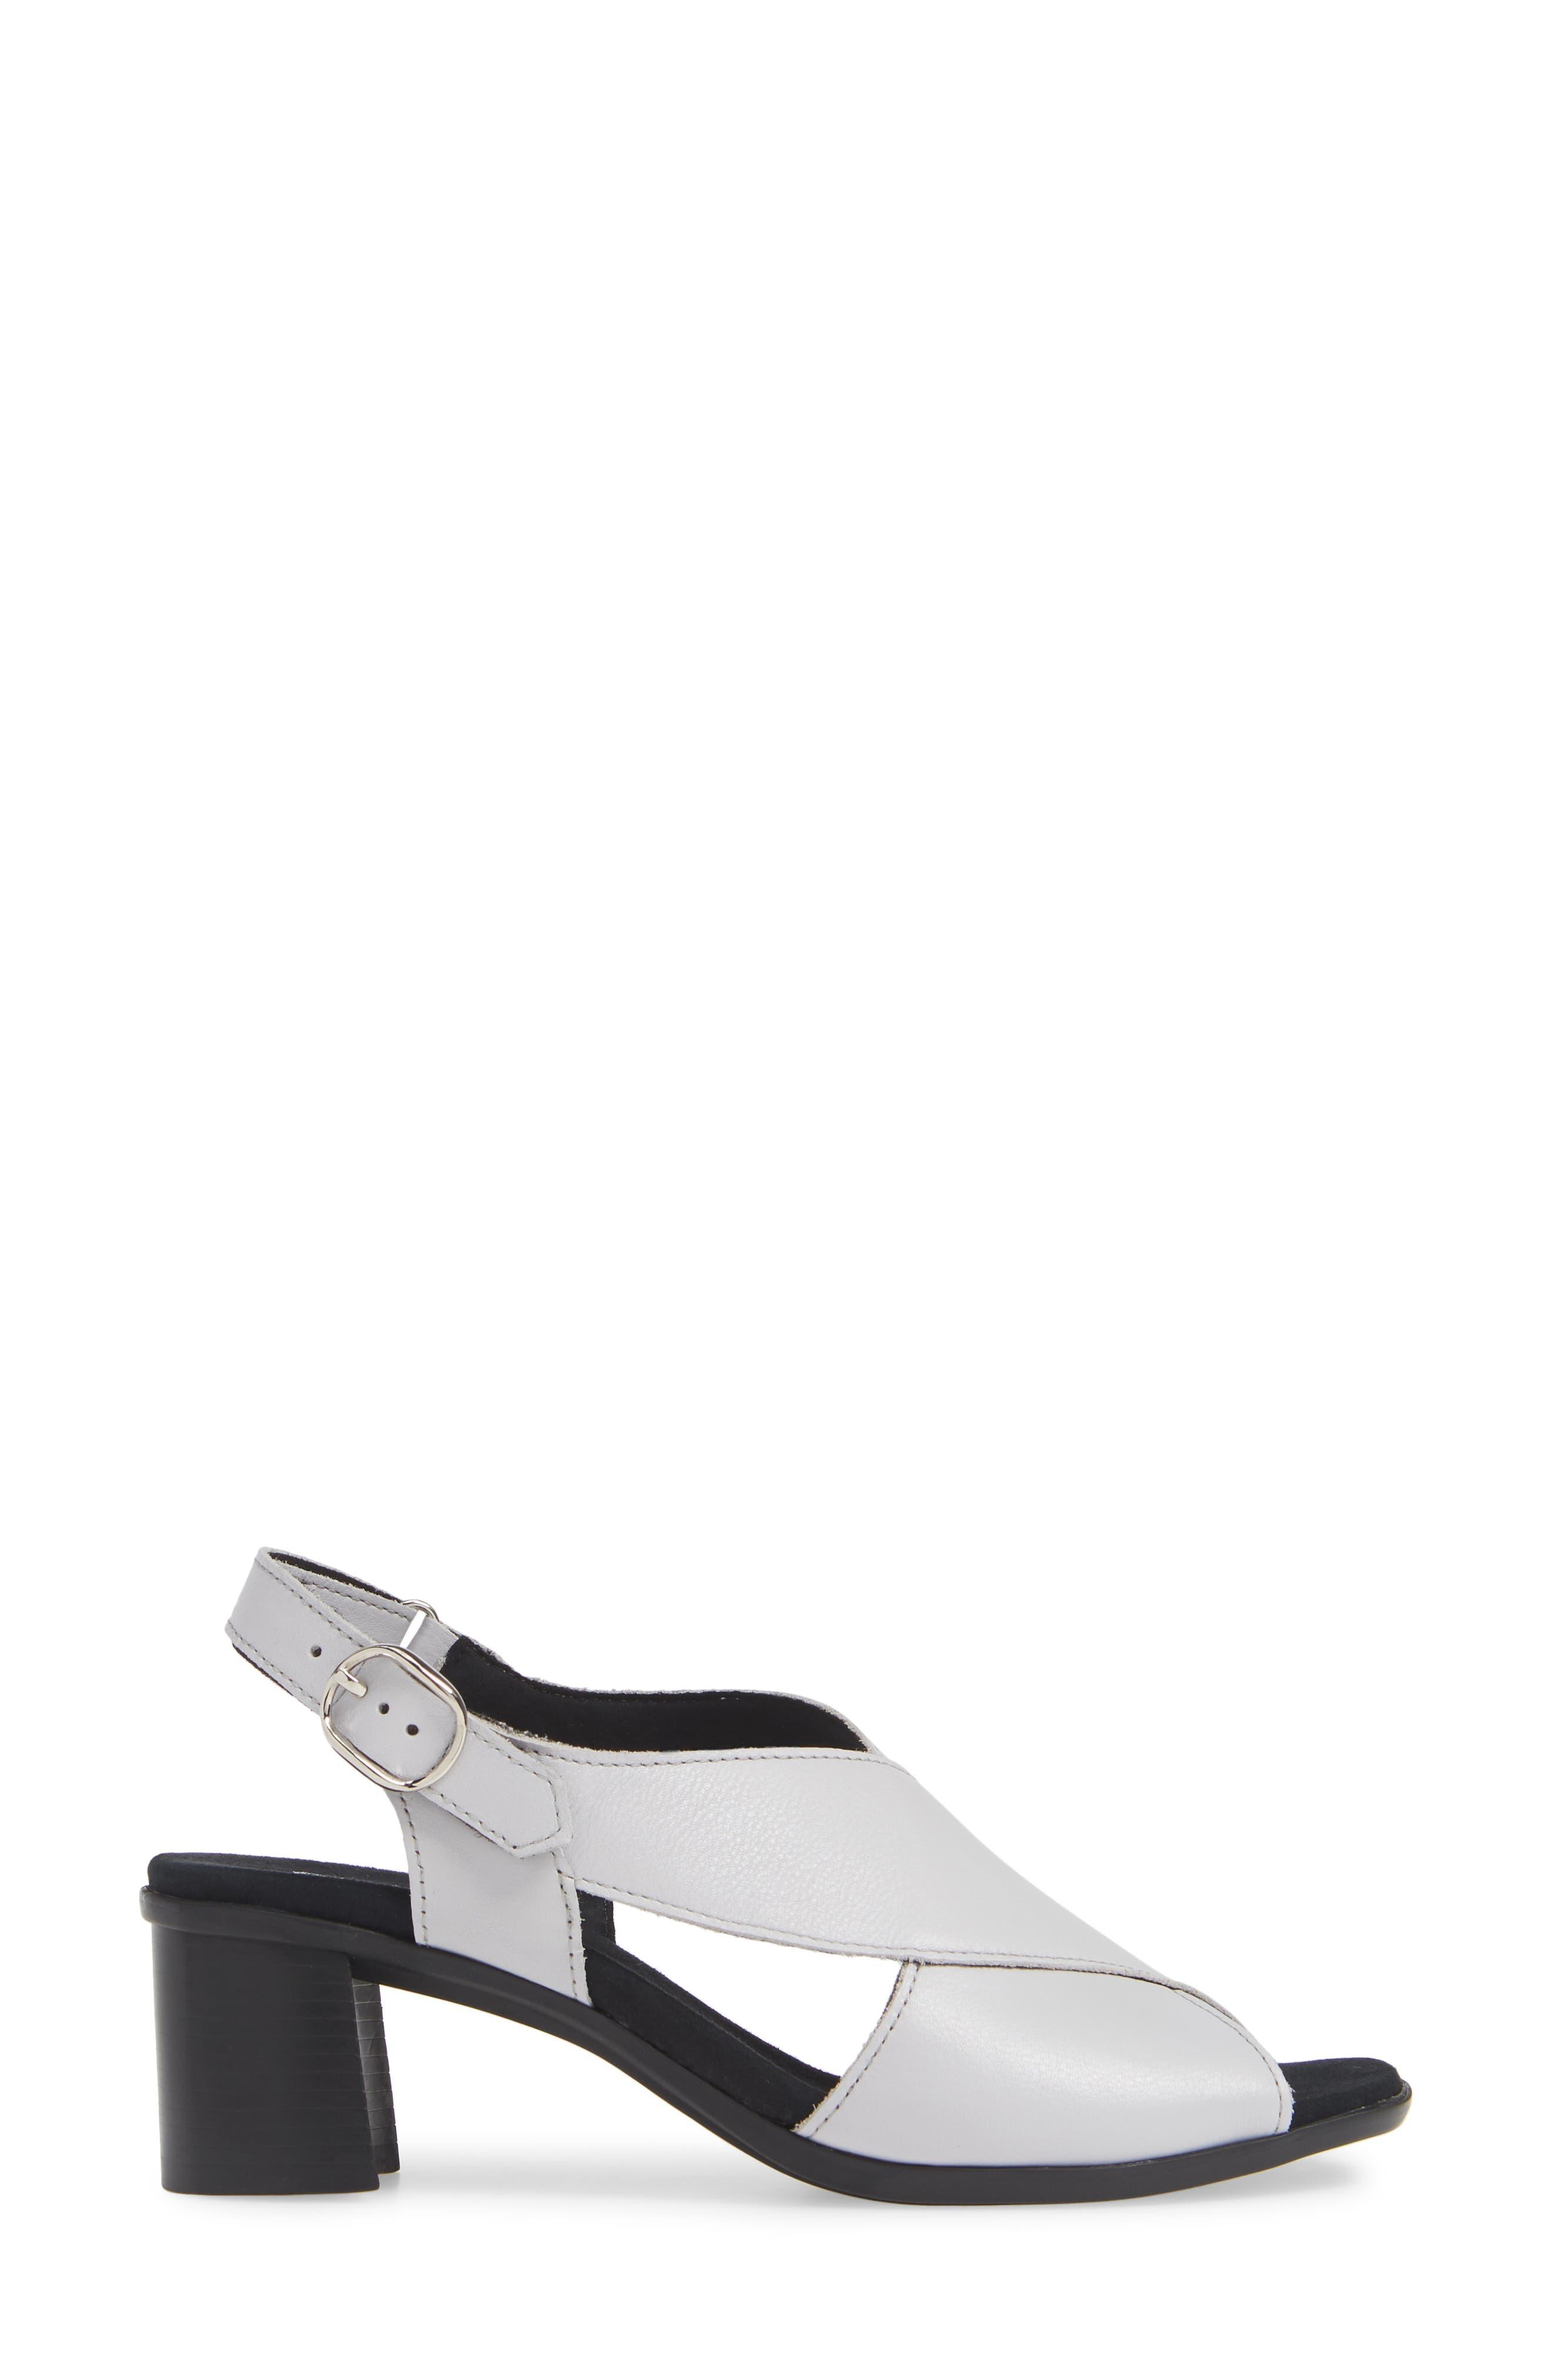 MUNRO, Laine Block Heel Sandal, Alternate thumbnail 3, color, WHITE LEATHER